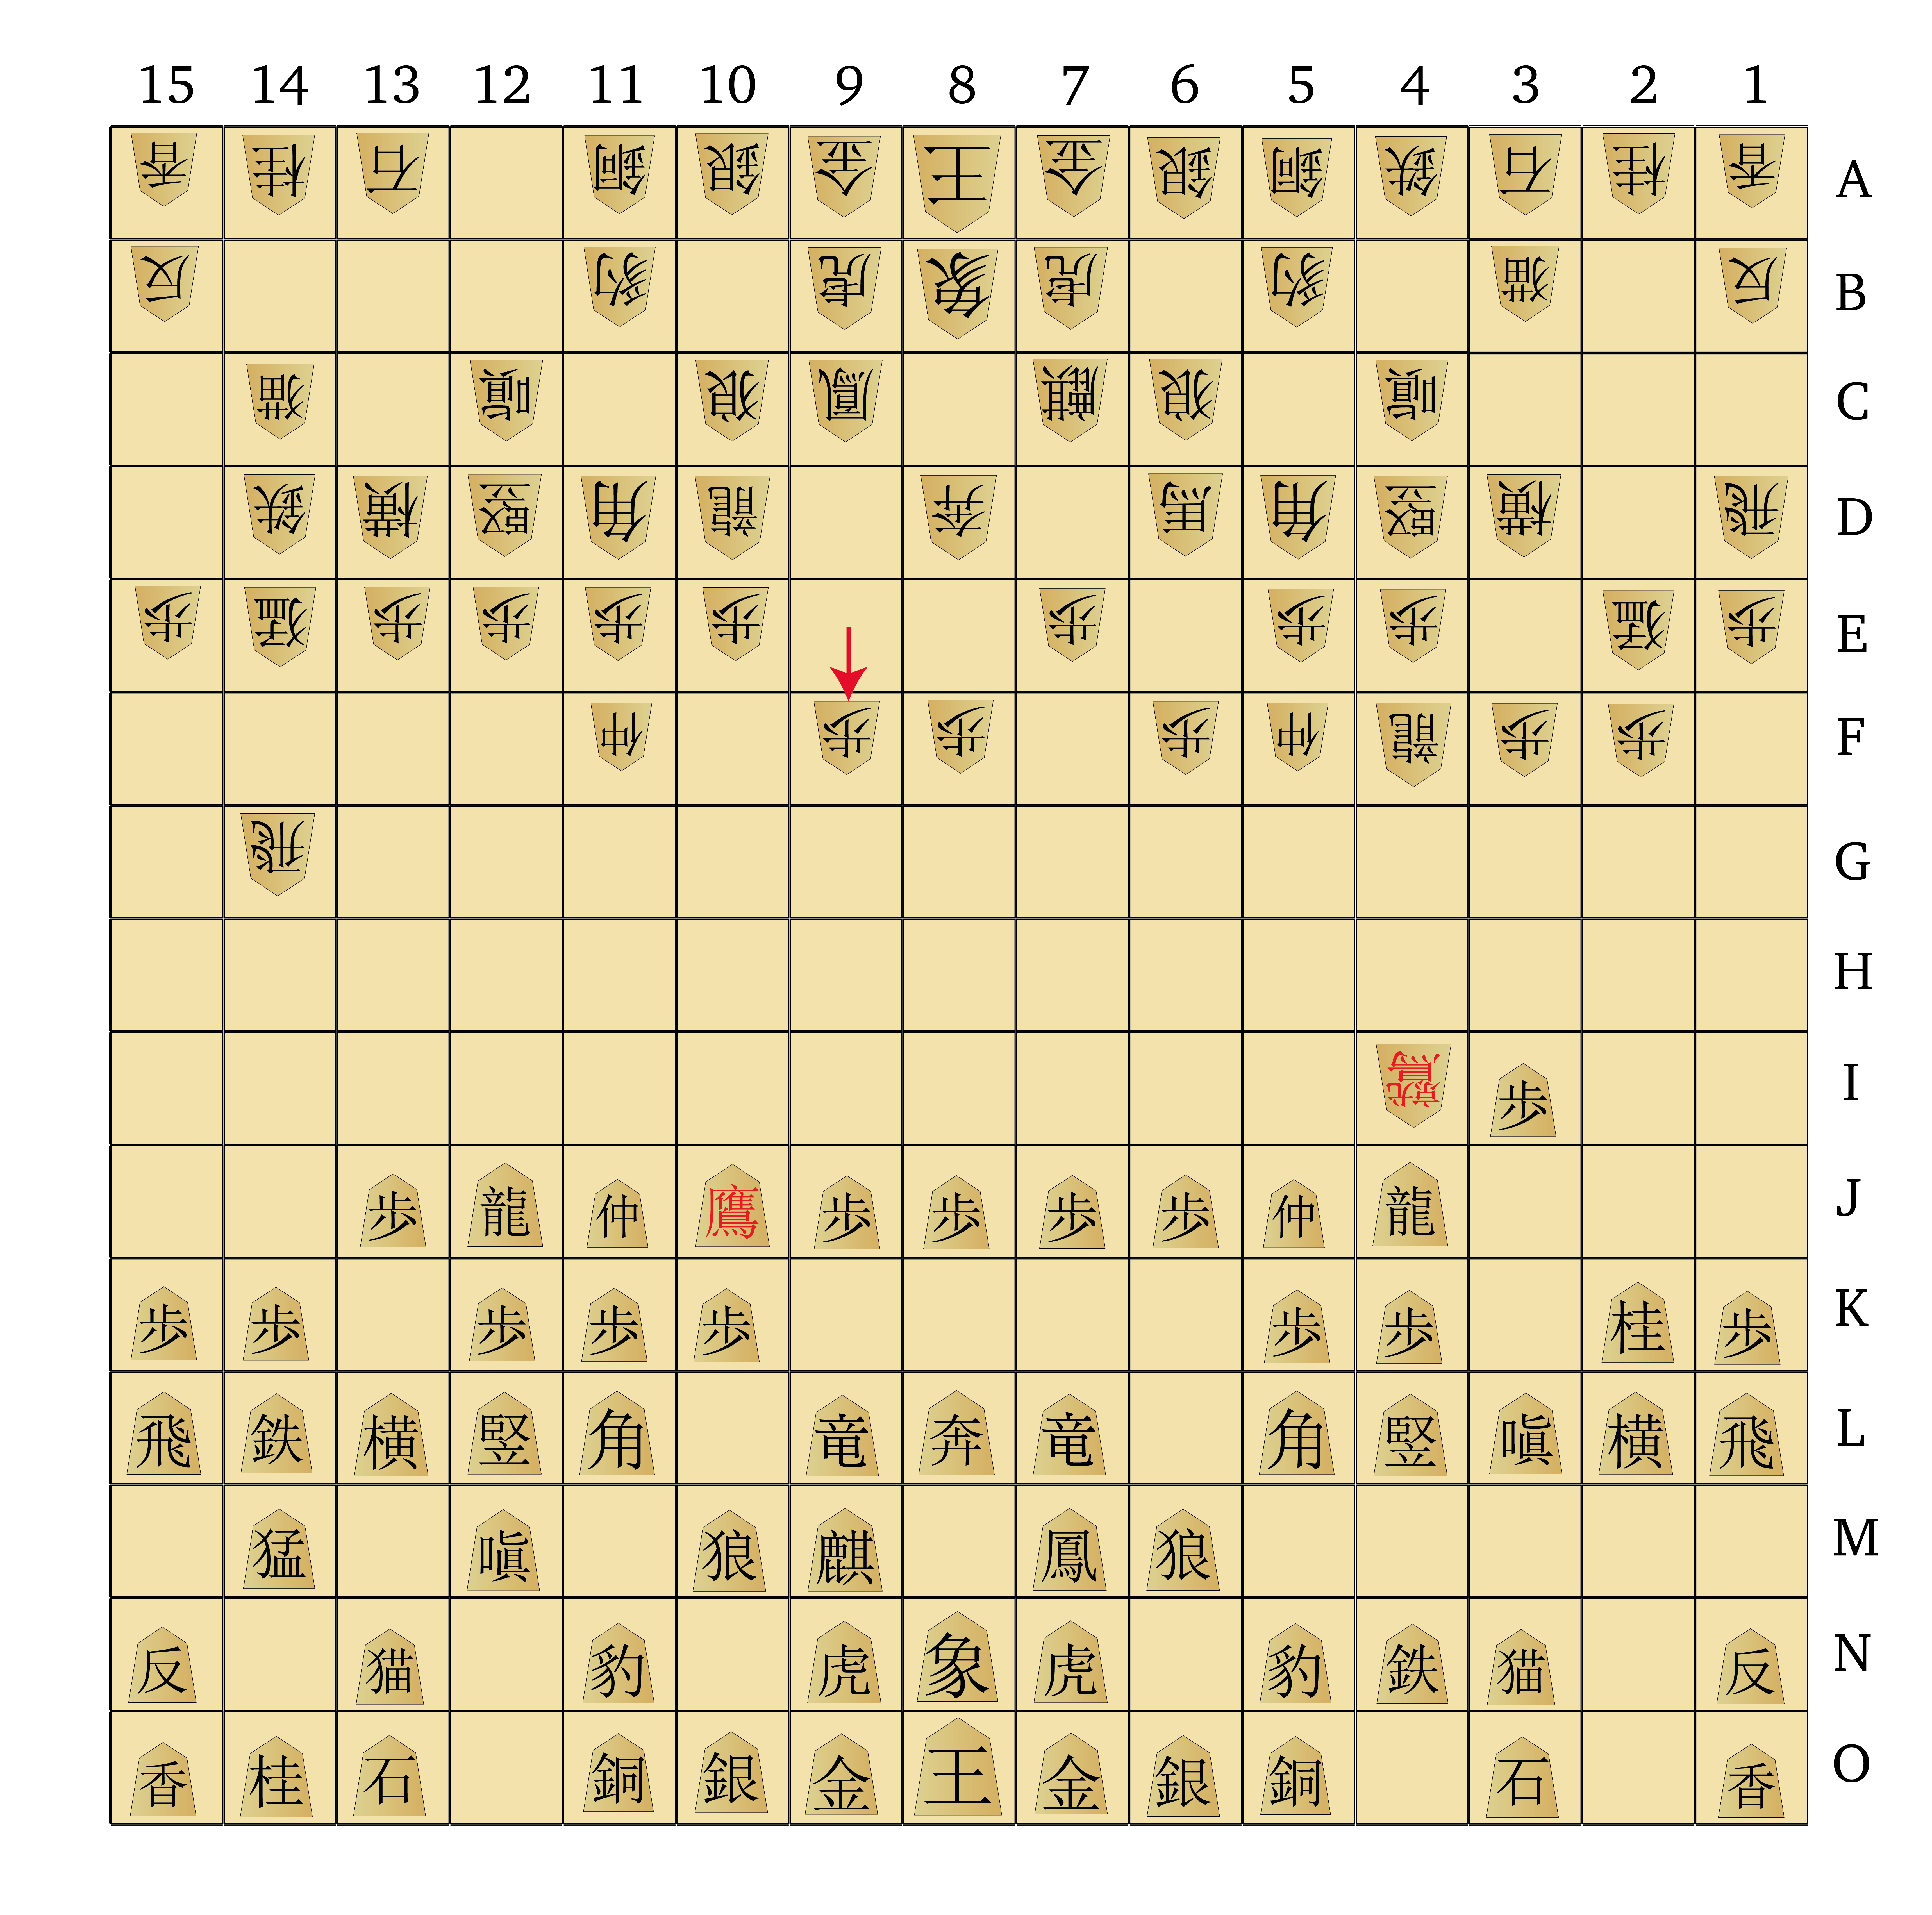 Dai Shogi 420 -- Move 60-01